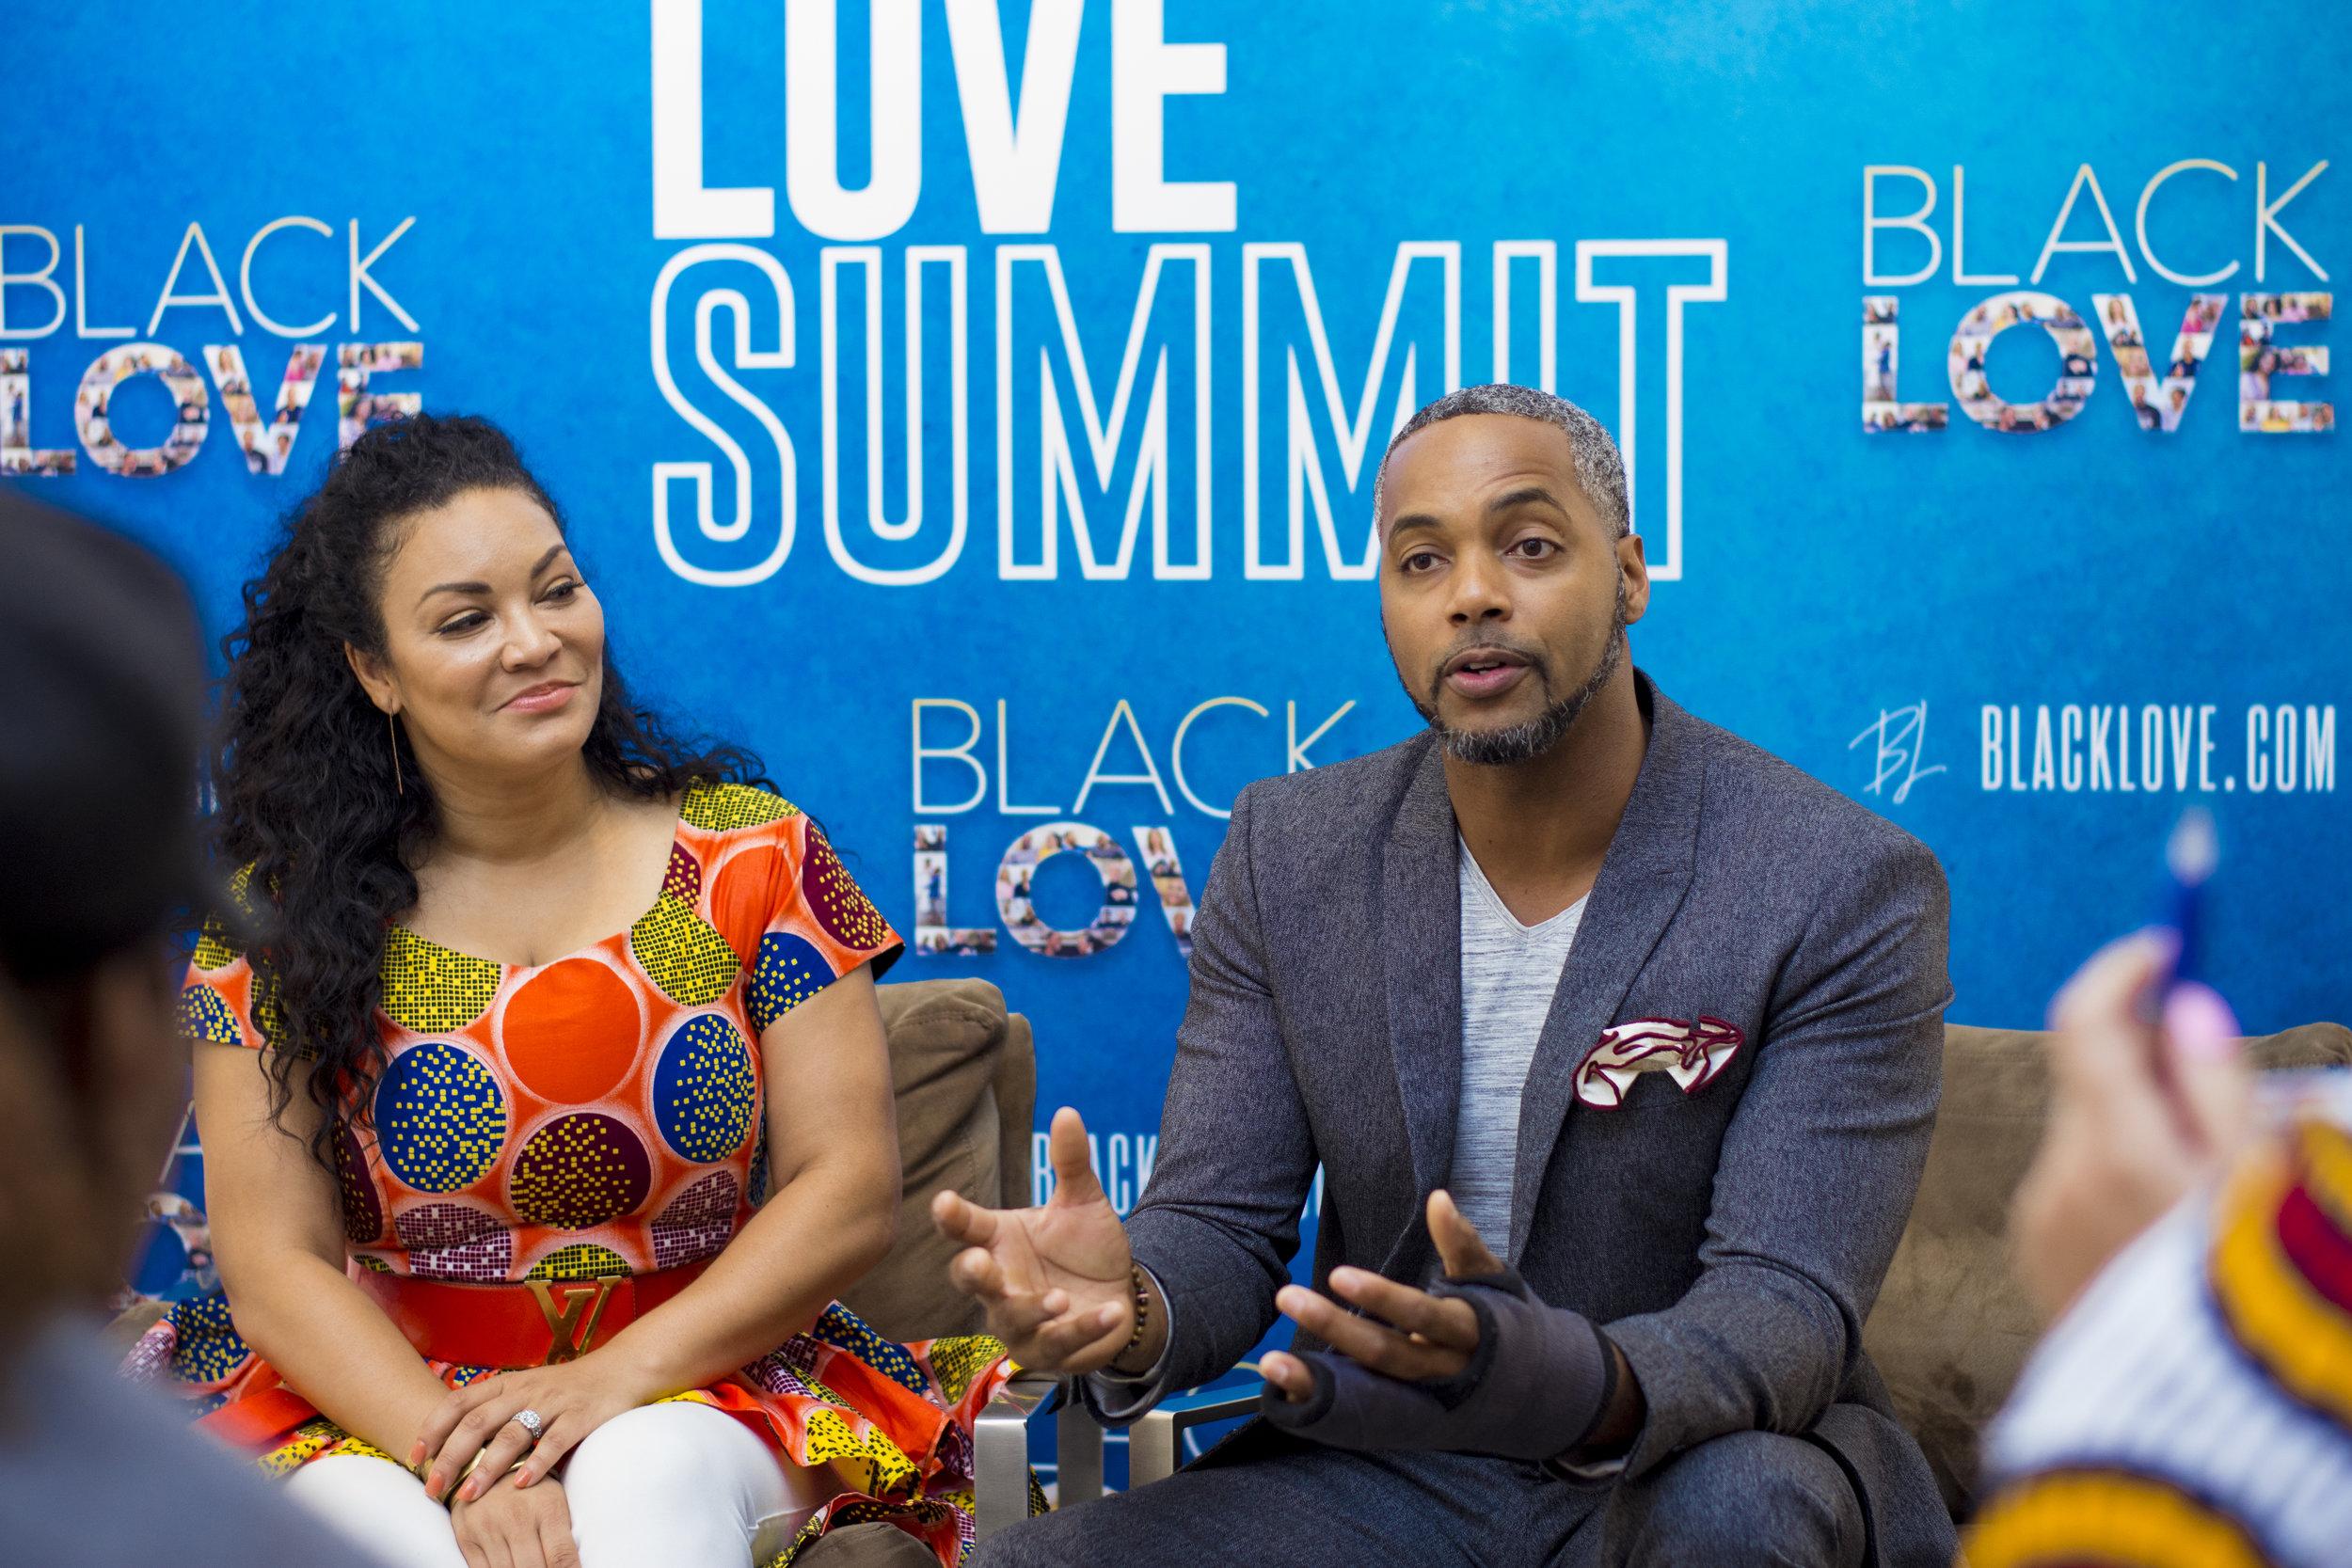 Black Love Summit 00026.jpg